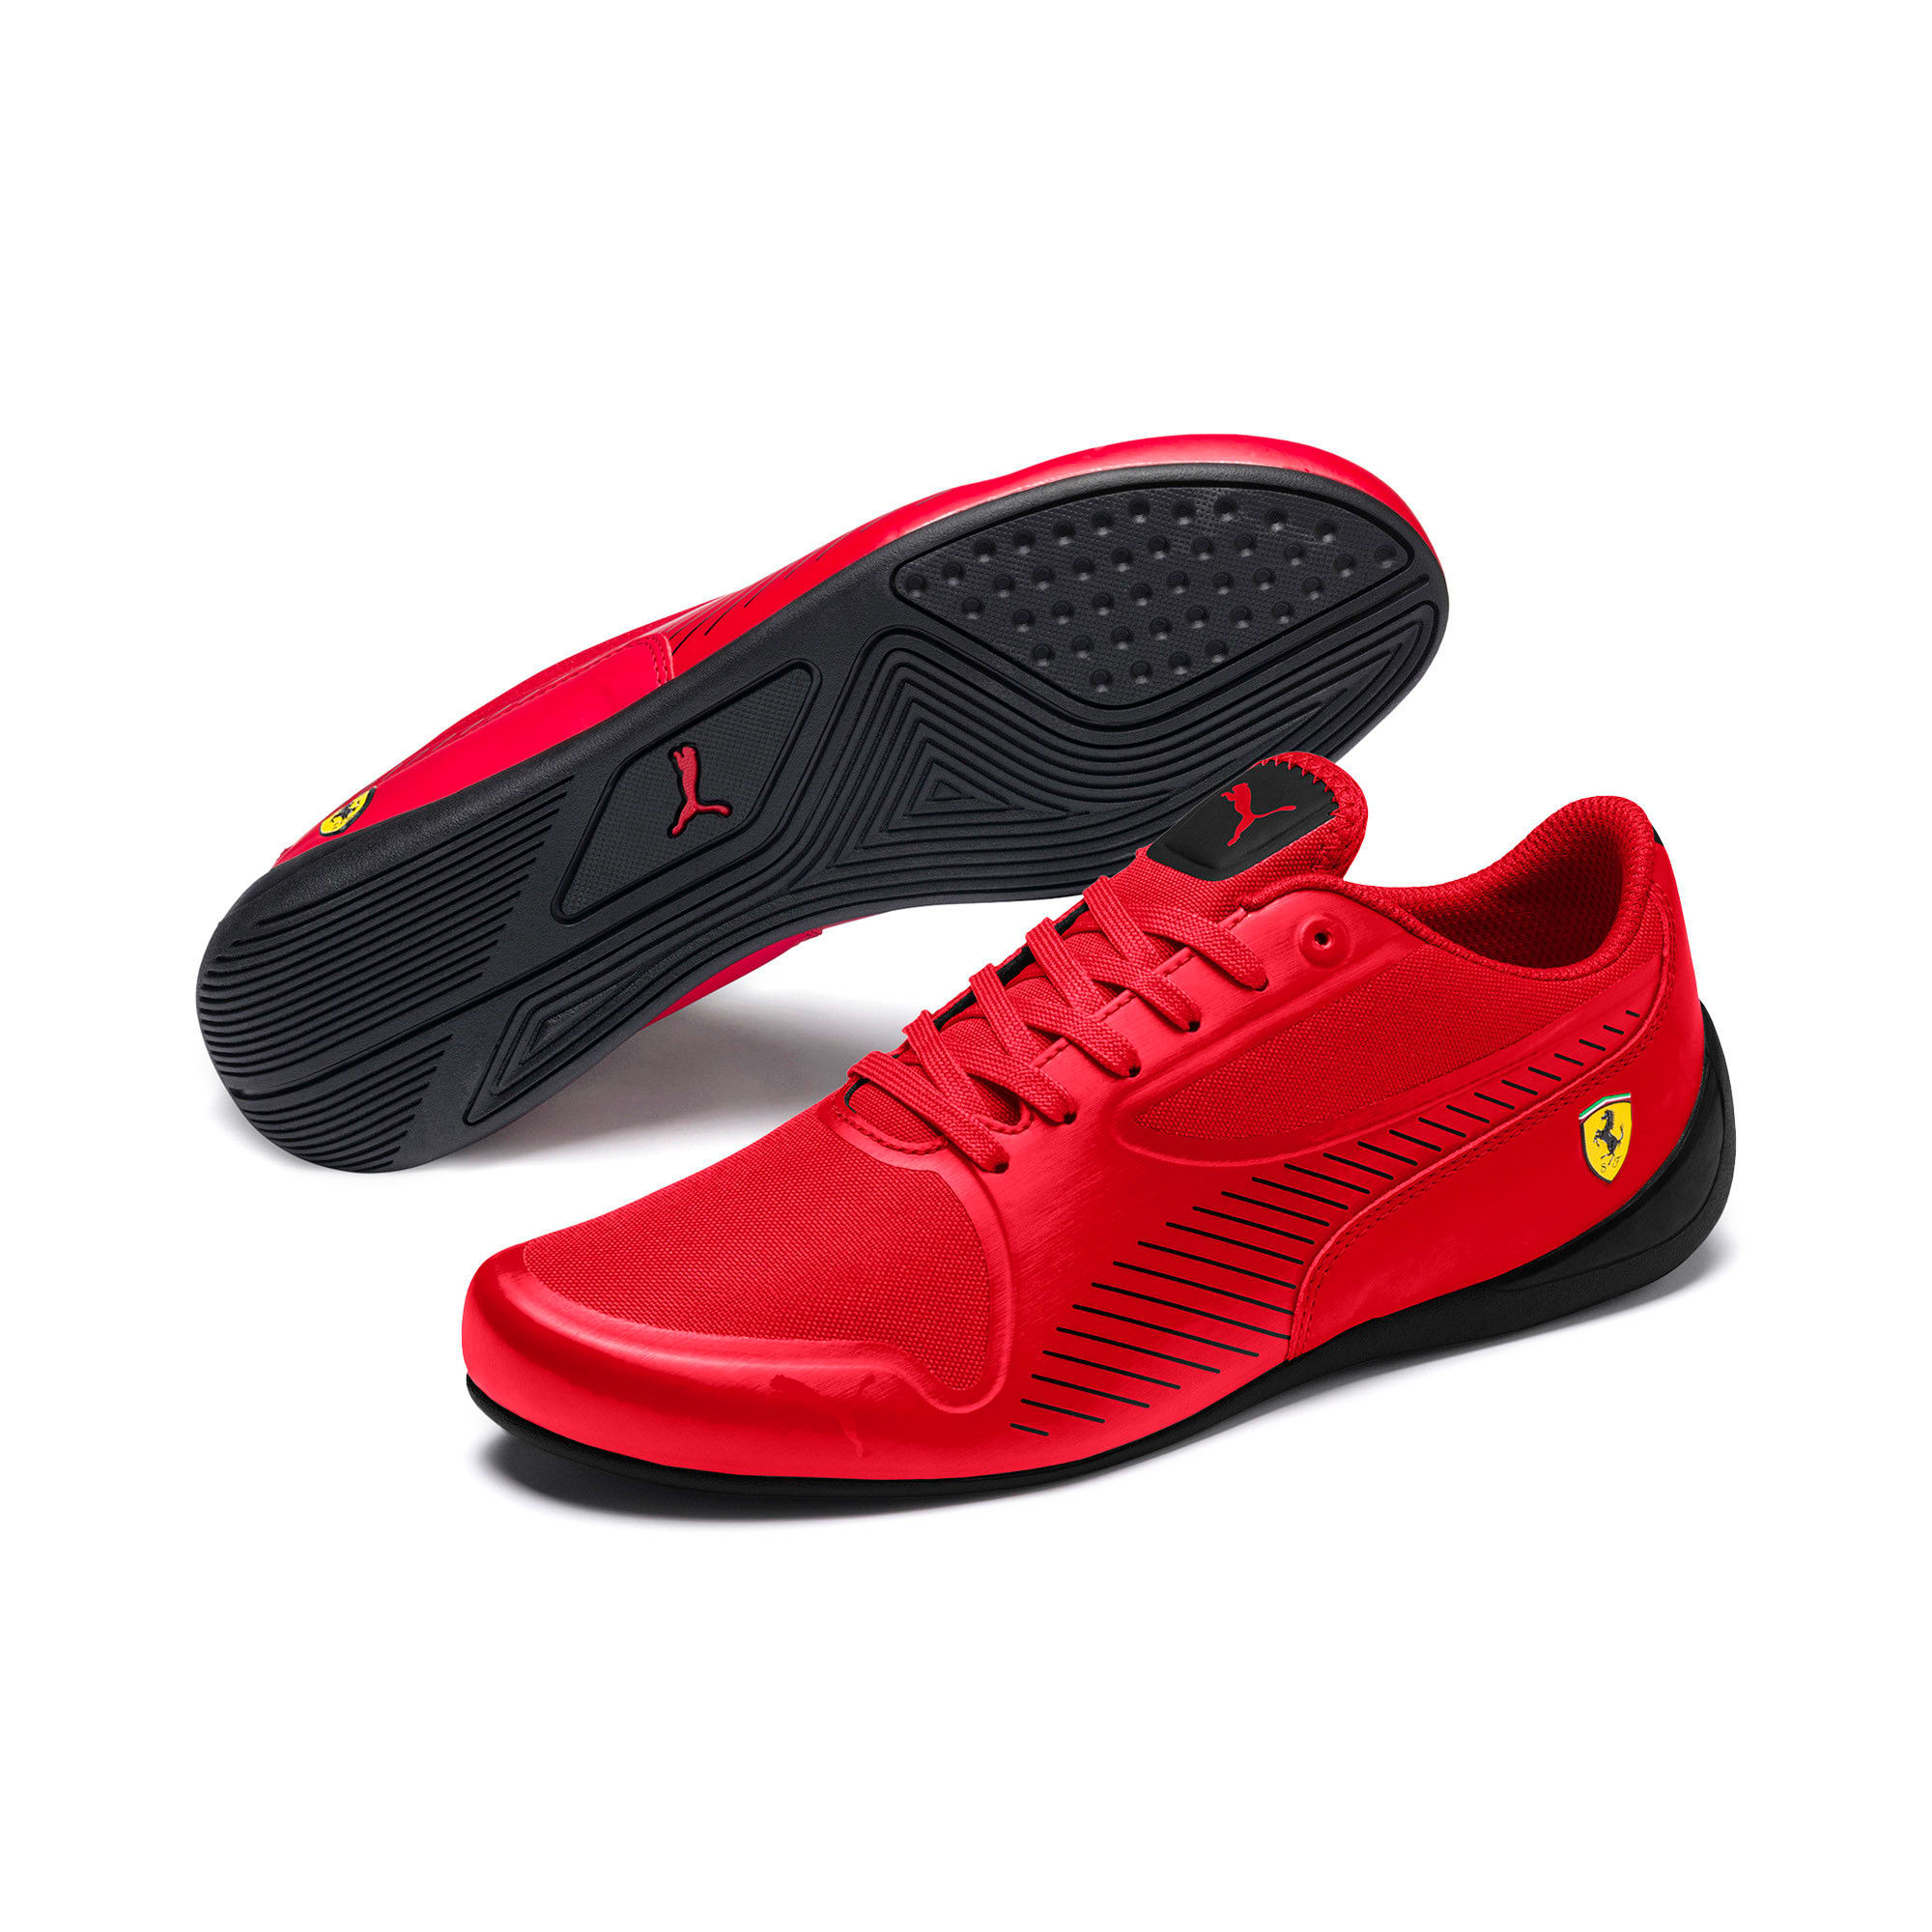 Thumbnail 2 of Scuderia Ferrari Drift Cat 7 Ultra Shoes, Rosso Corsa-Puma Black, medium